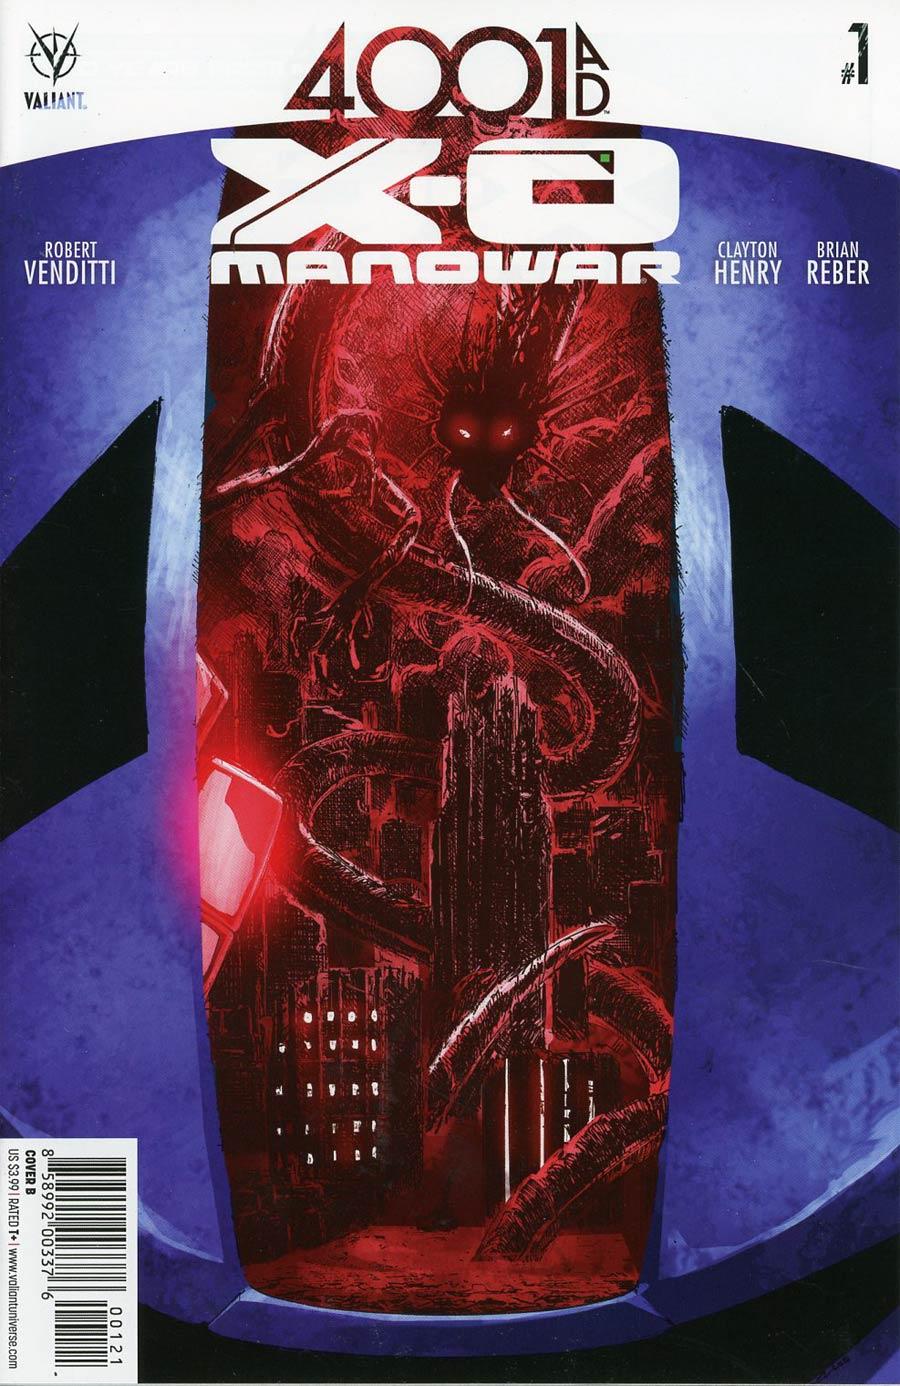 4001 AD X-O Manowar #1 Cover B Variant Phil Jimenez Cover